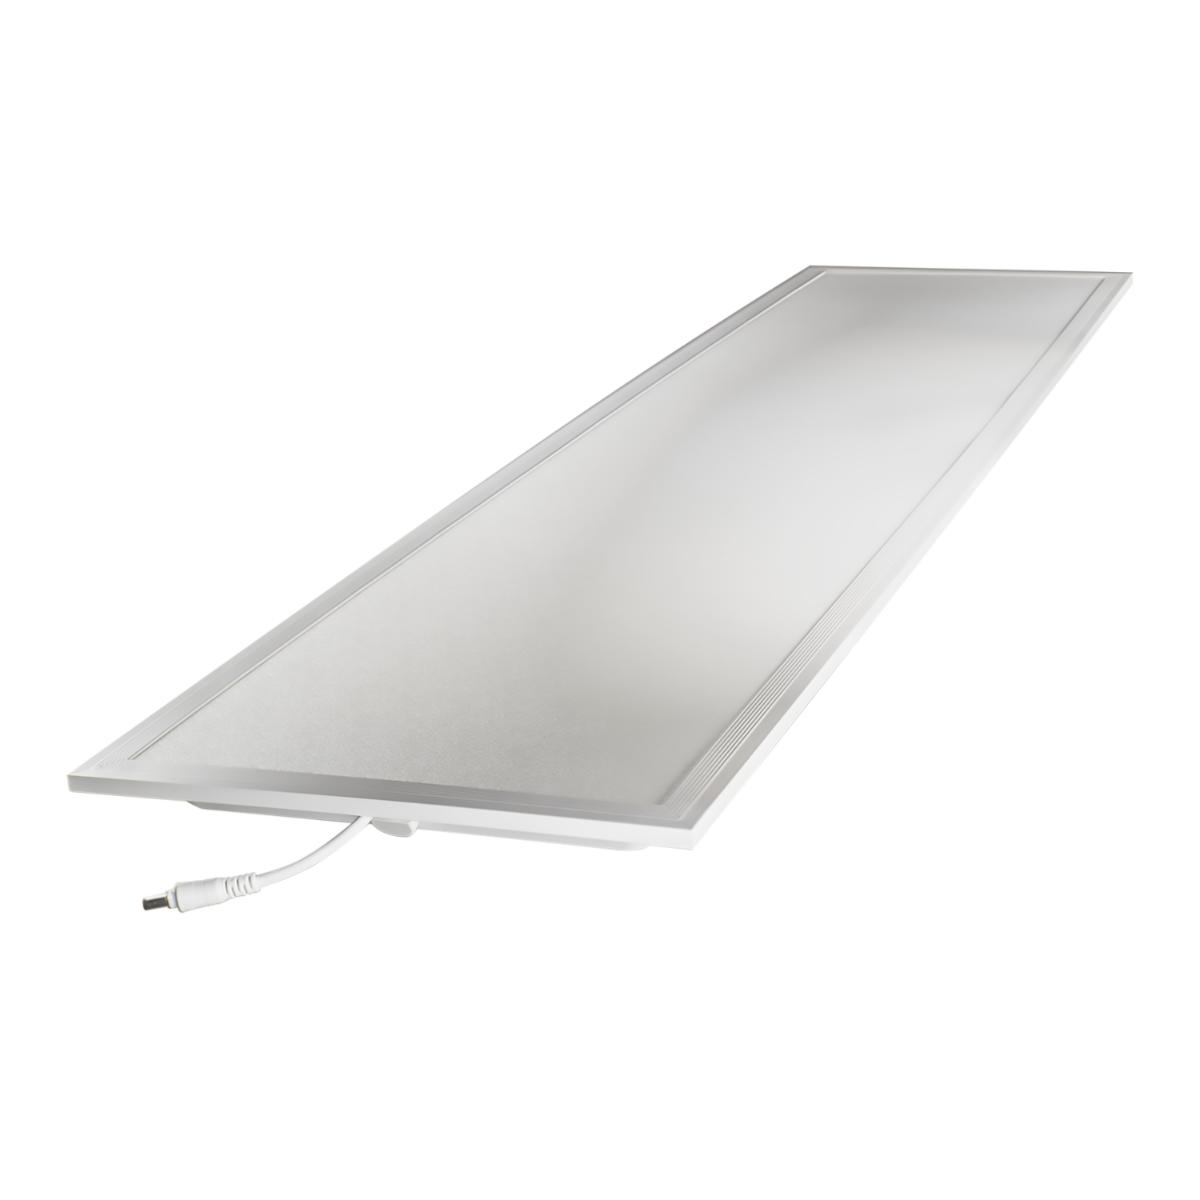 Noxion LED Panel Econox 32W Xitanium DALI 30x120cm 6500K 4400lm UGR <22 | Dali Dimmable - Replacer for 2x36W